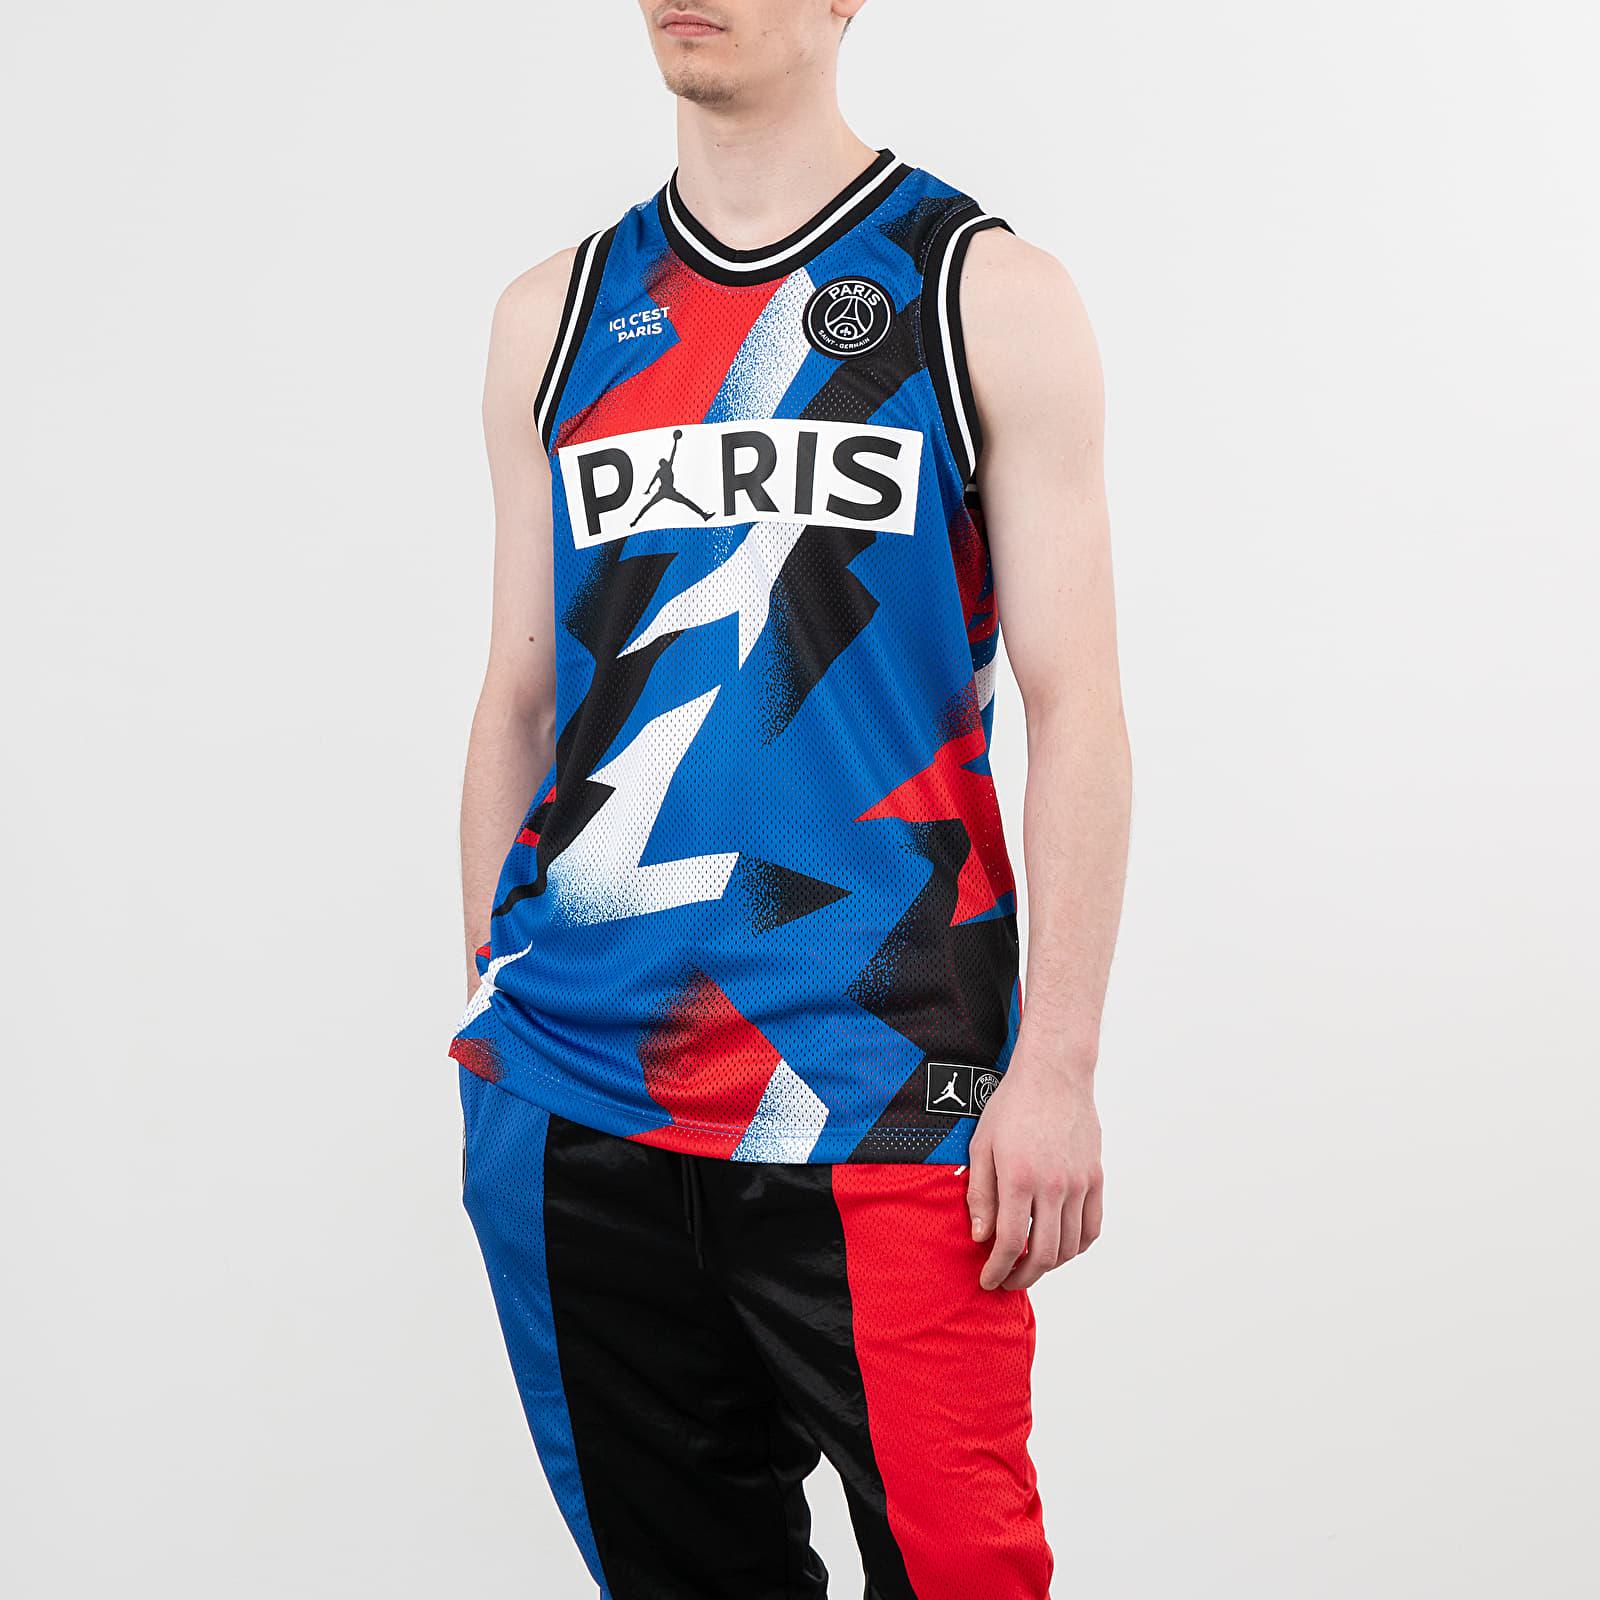 T-Shirts Jordan Paris Saint-Germain Mesh Jersey Hyper Cobalt